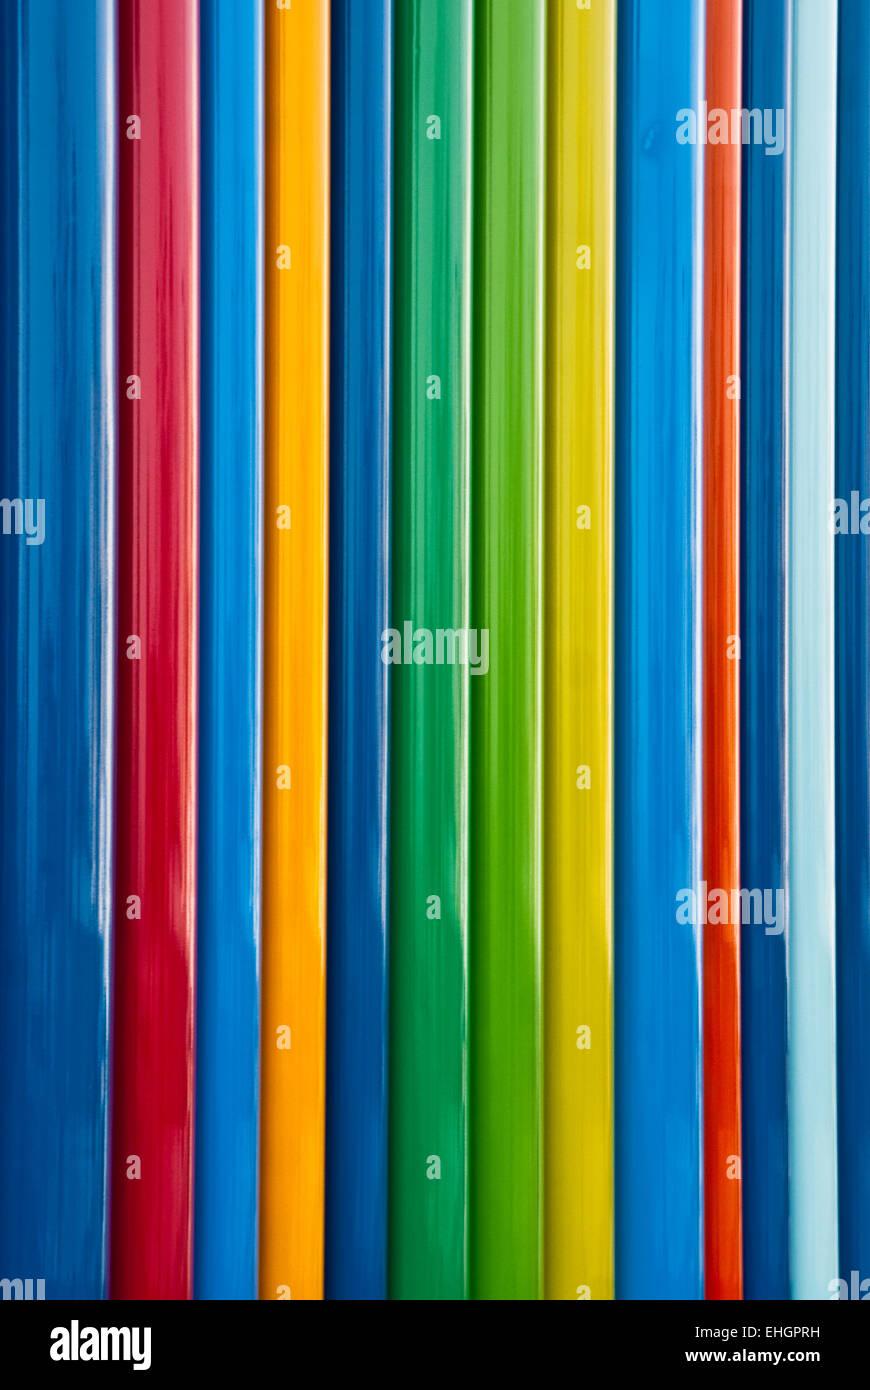 Columns of full spectrum primary colors - Stock Image